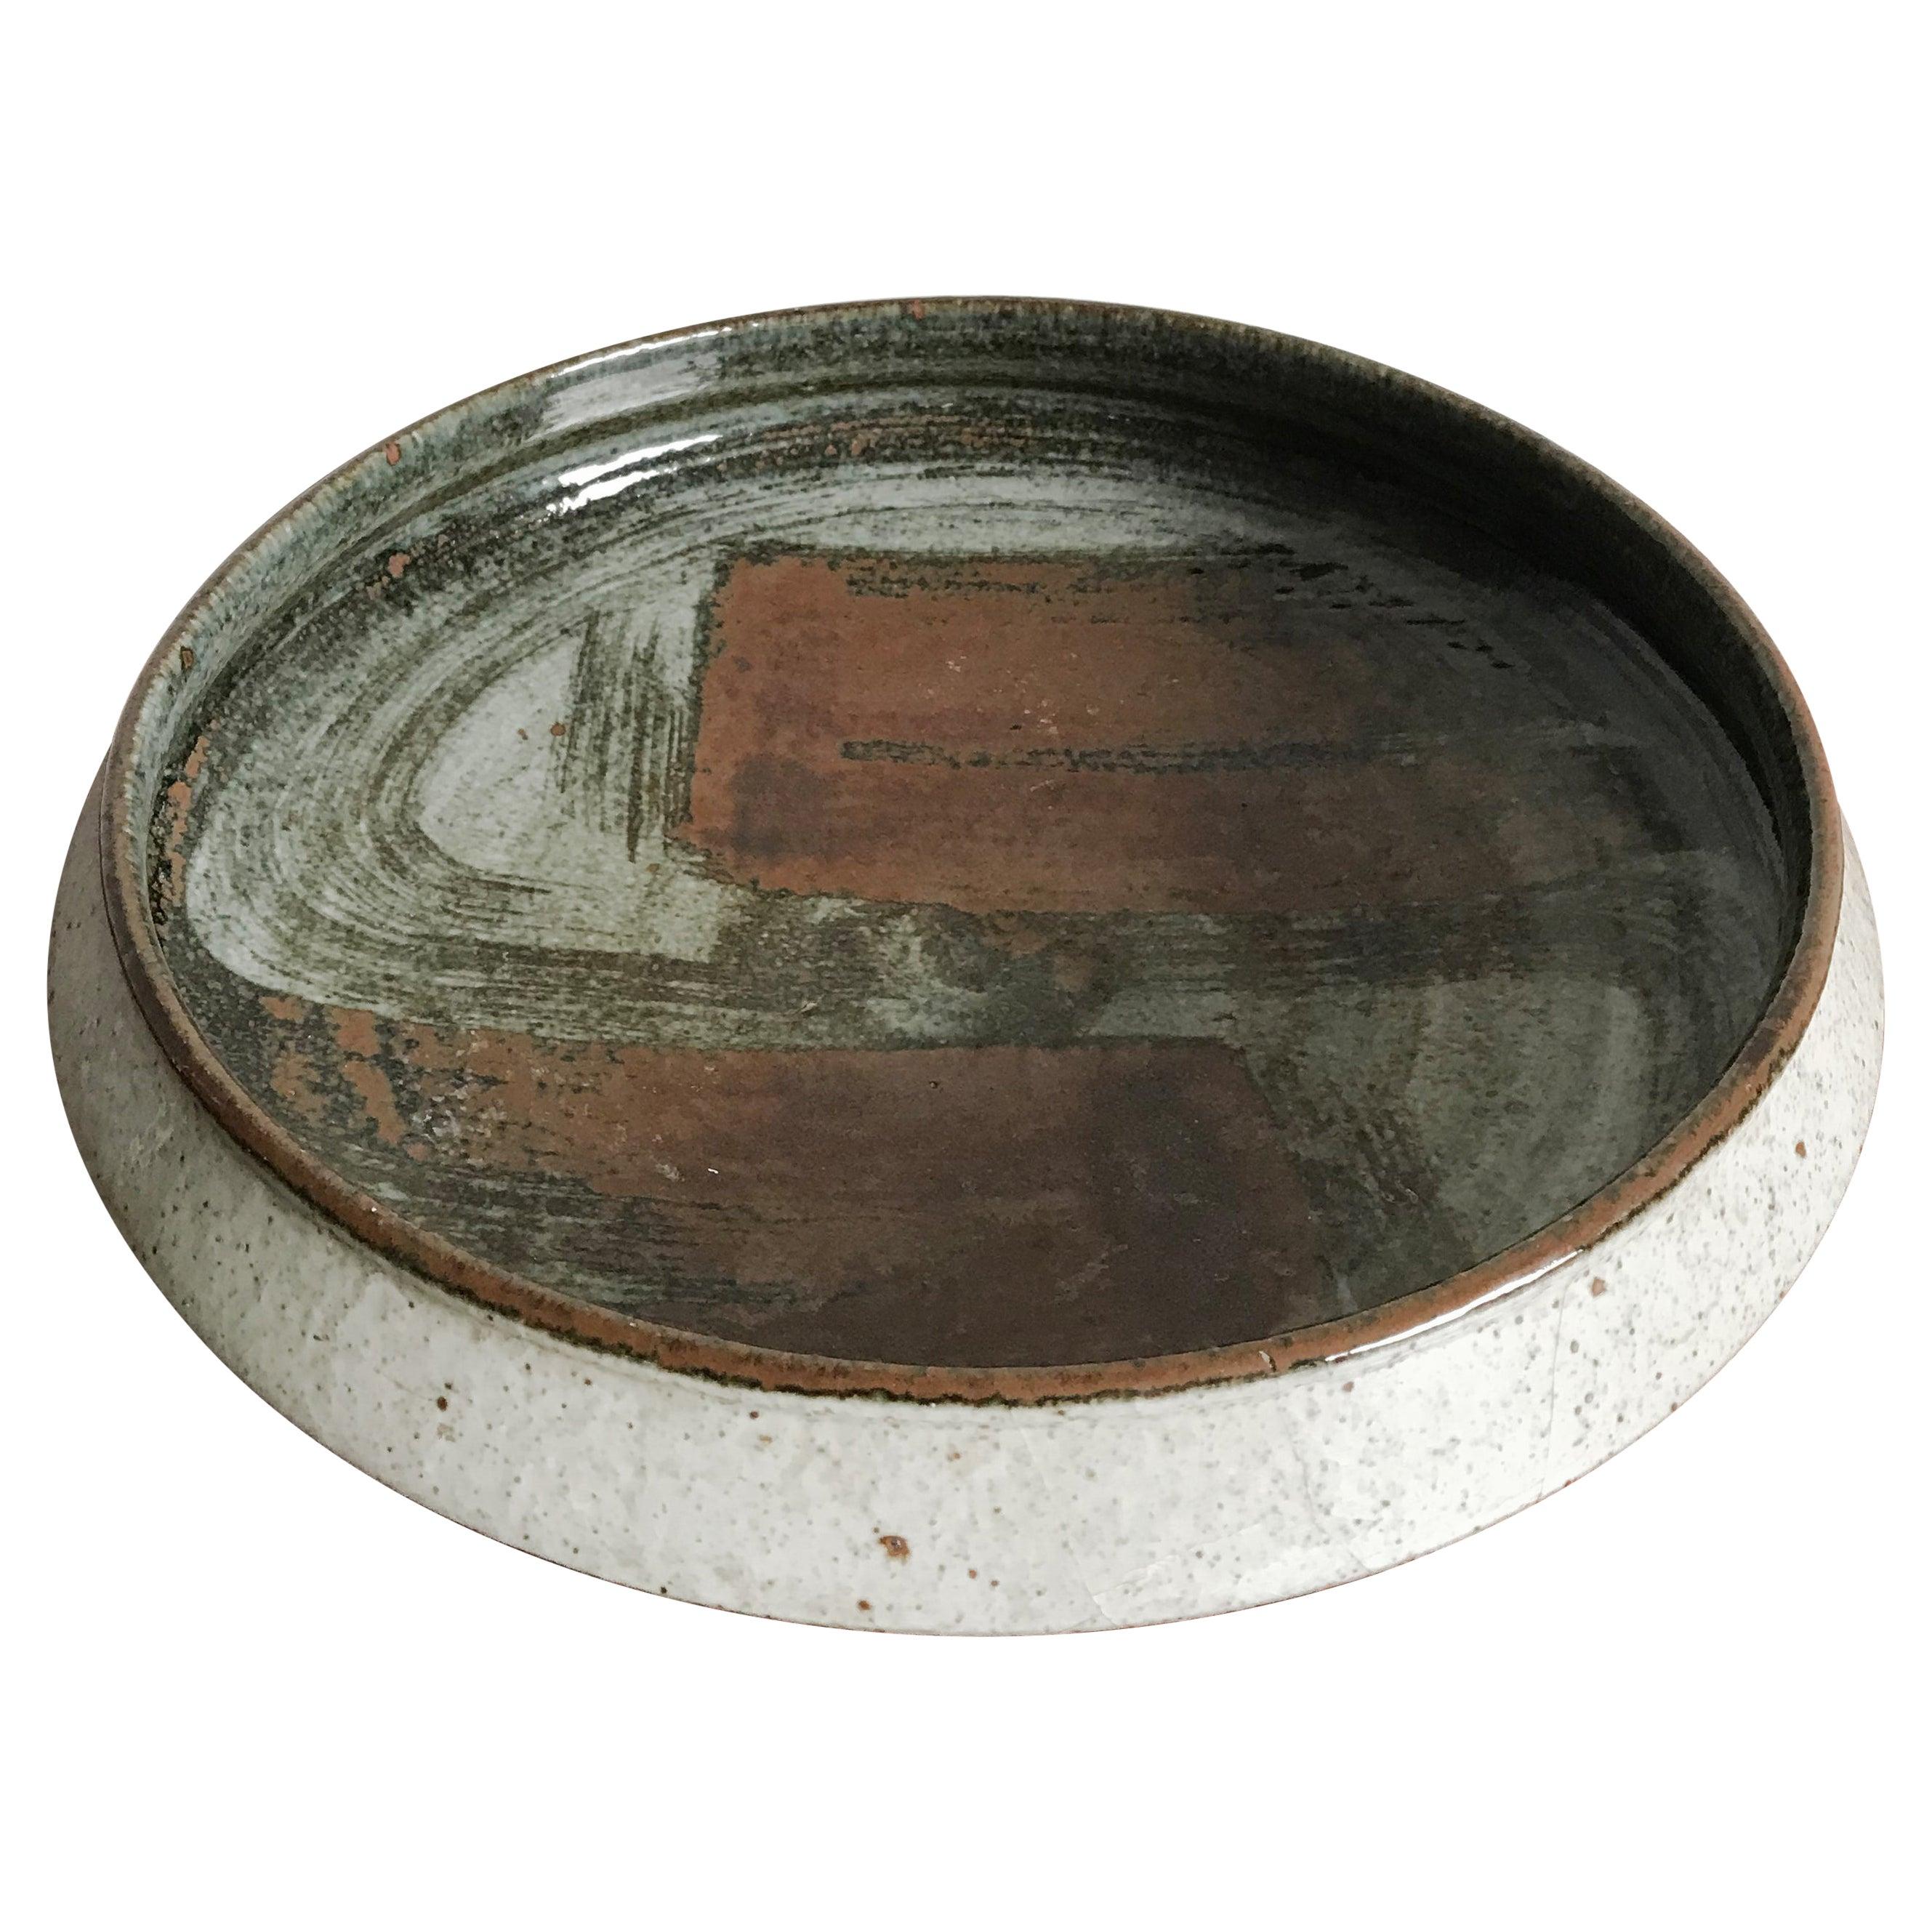 Rörstrand Scandinavian Ceramic Bowl Centerpiece, Swedish 1970s